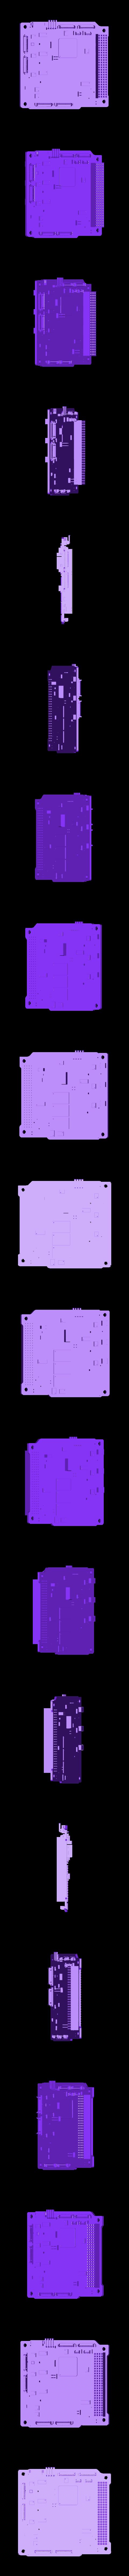 FlightComputer.stl Download free STL file ArduSat • 3D printing template, Loustic3D888